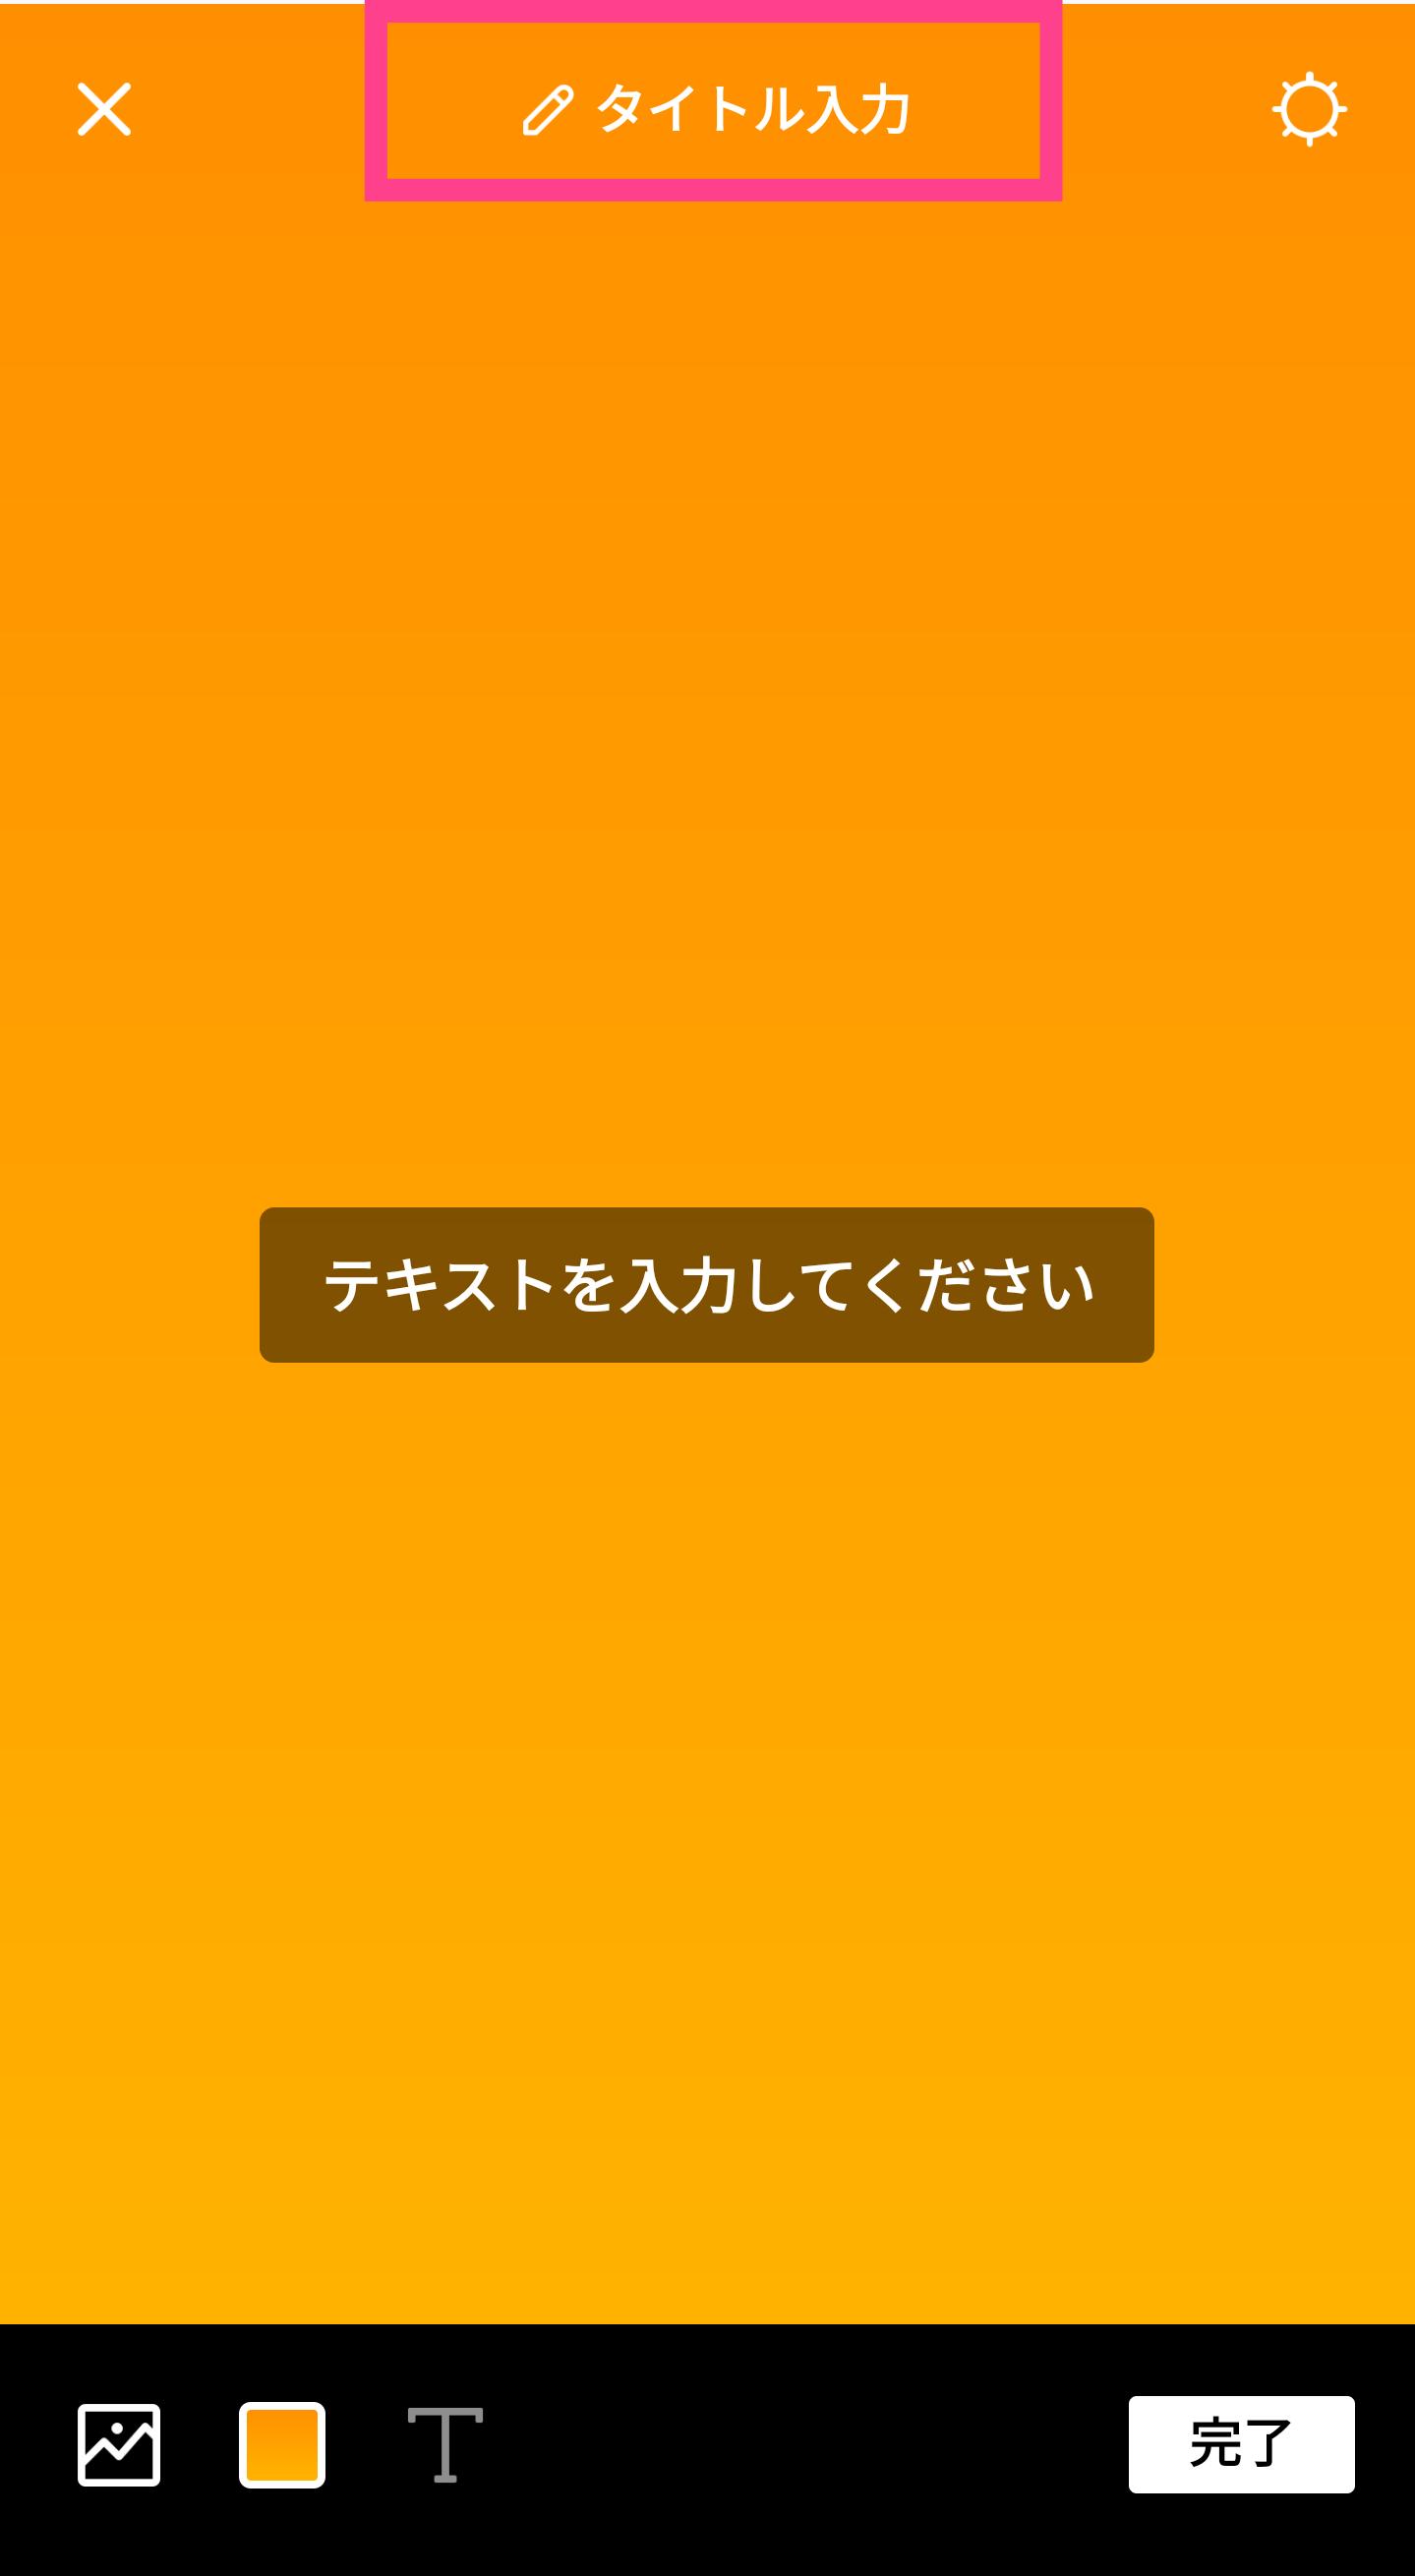 Spoon-TALKタイトル設定